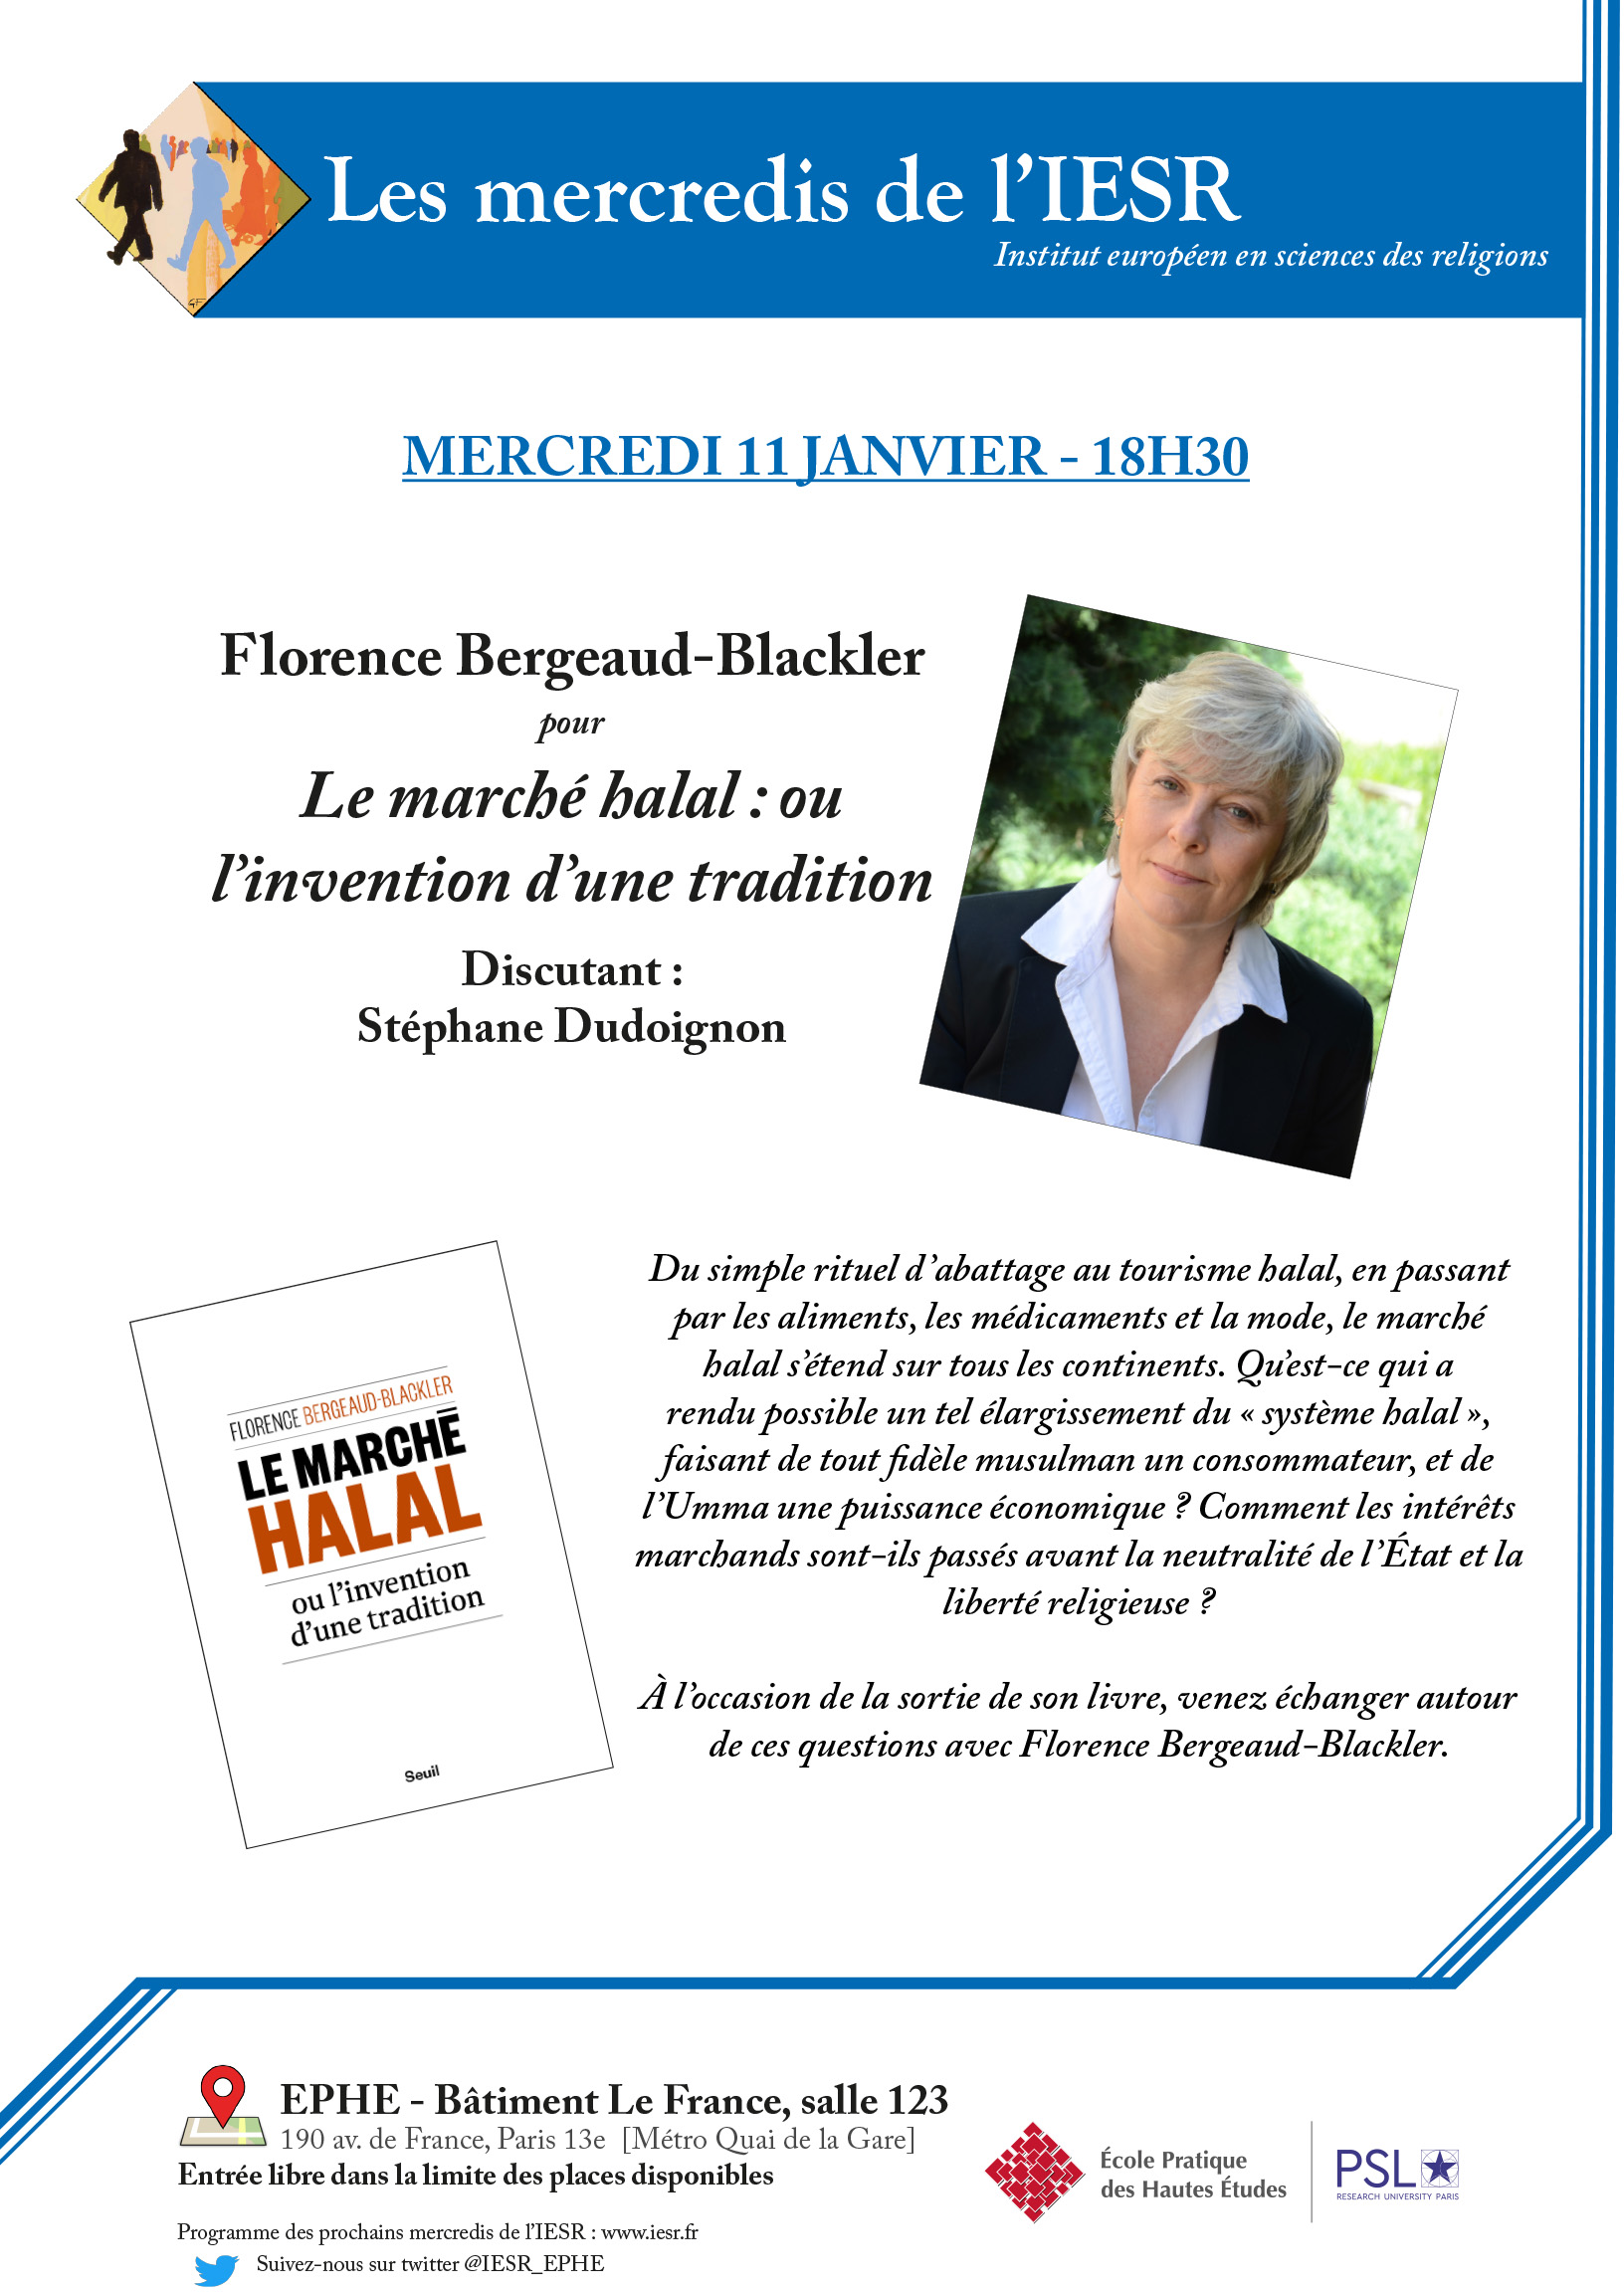 miesr-bergeaud-blackler-11jan-a4